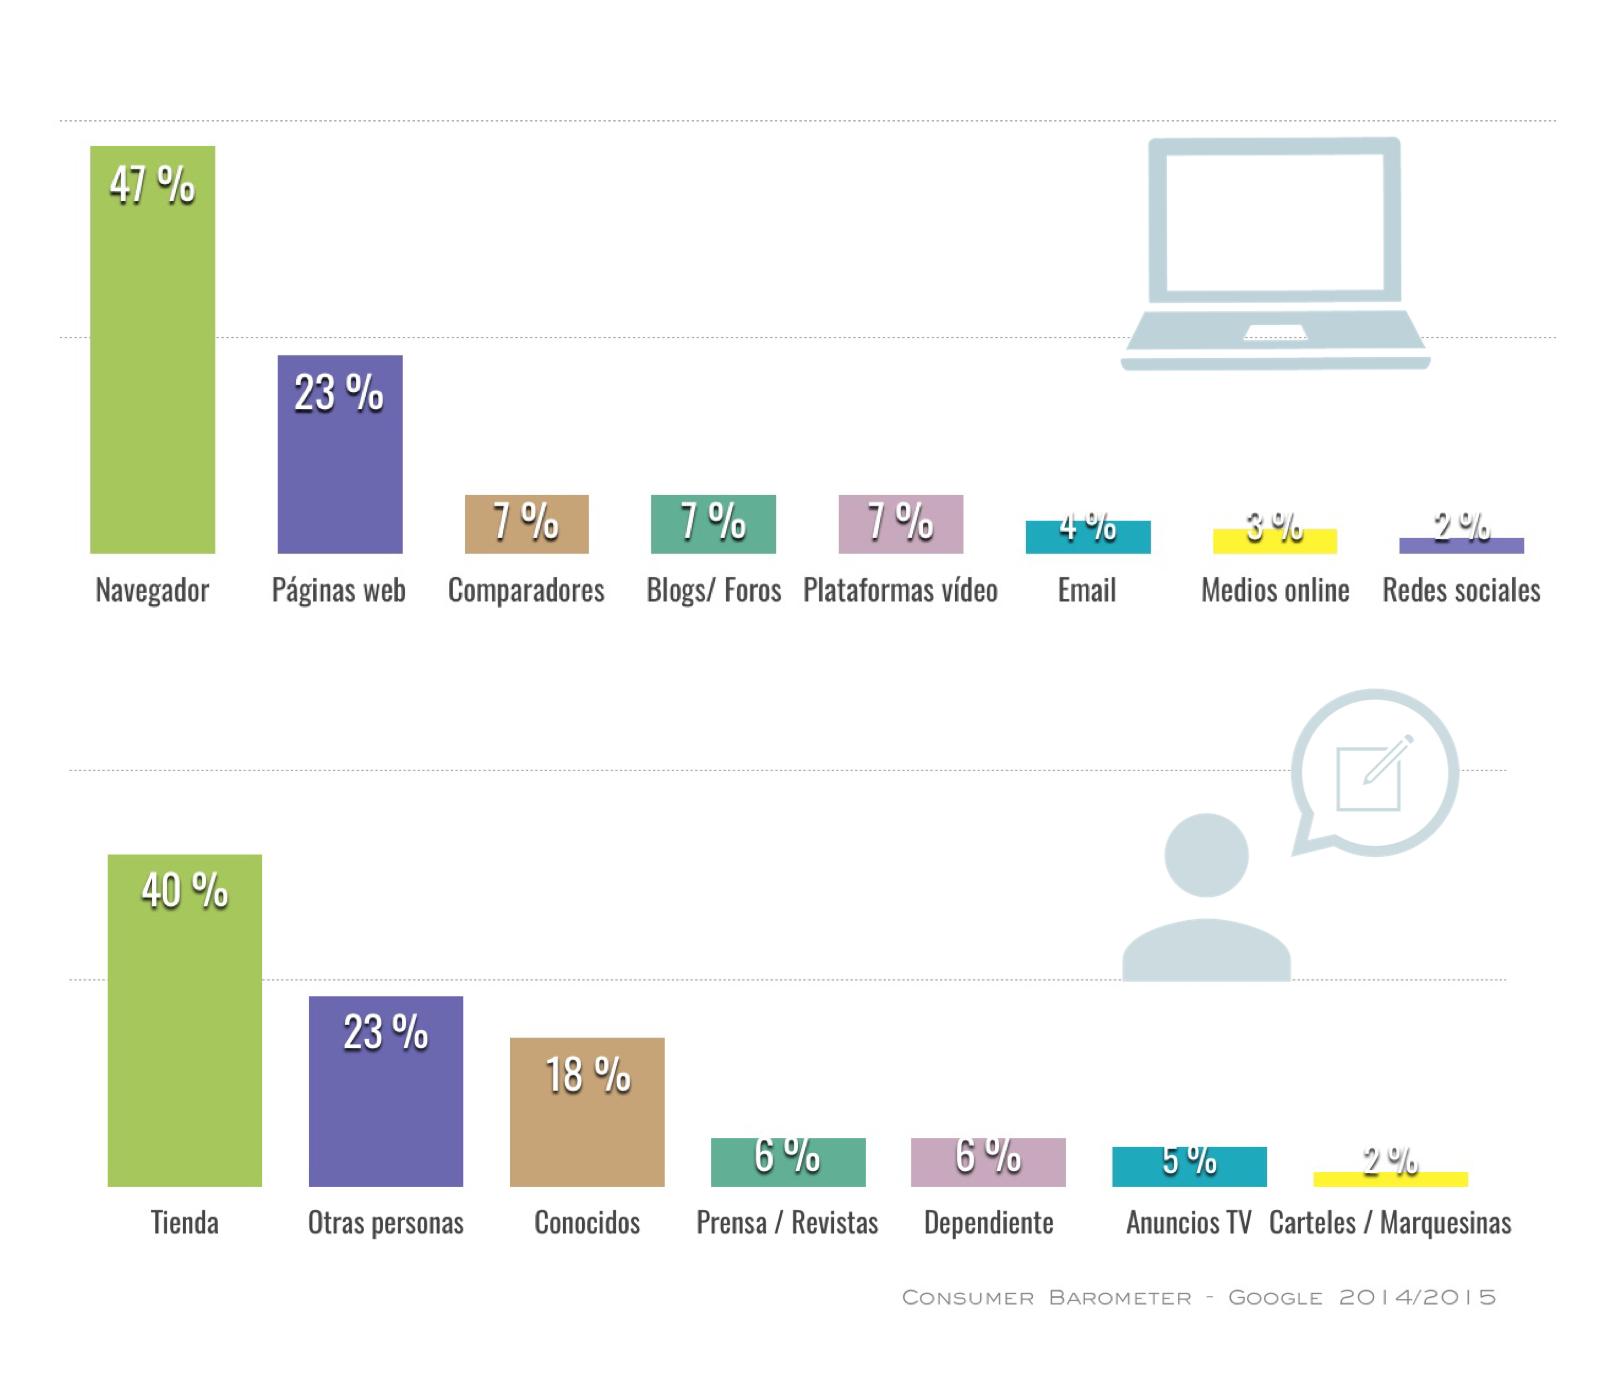 grafico-motivos-consulta-compra